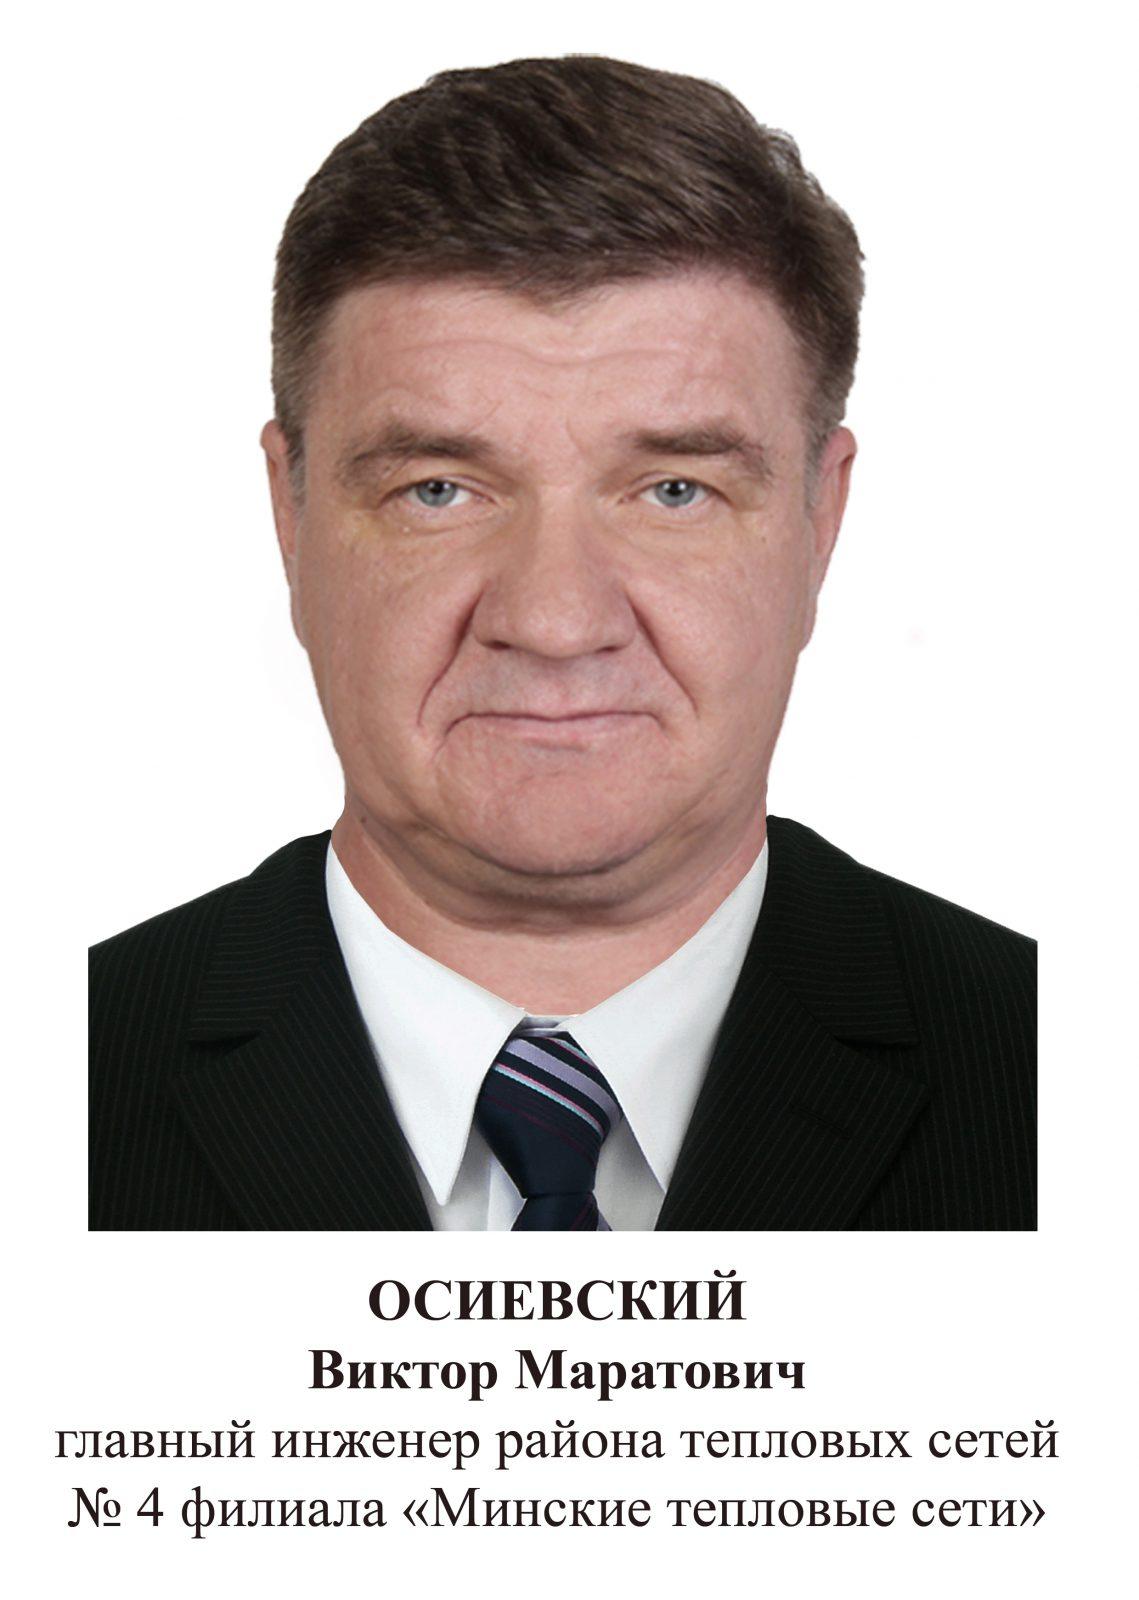 Осиевский Виктор Маратович